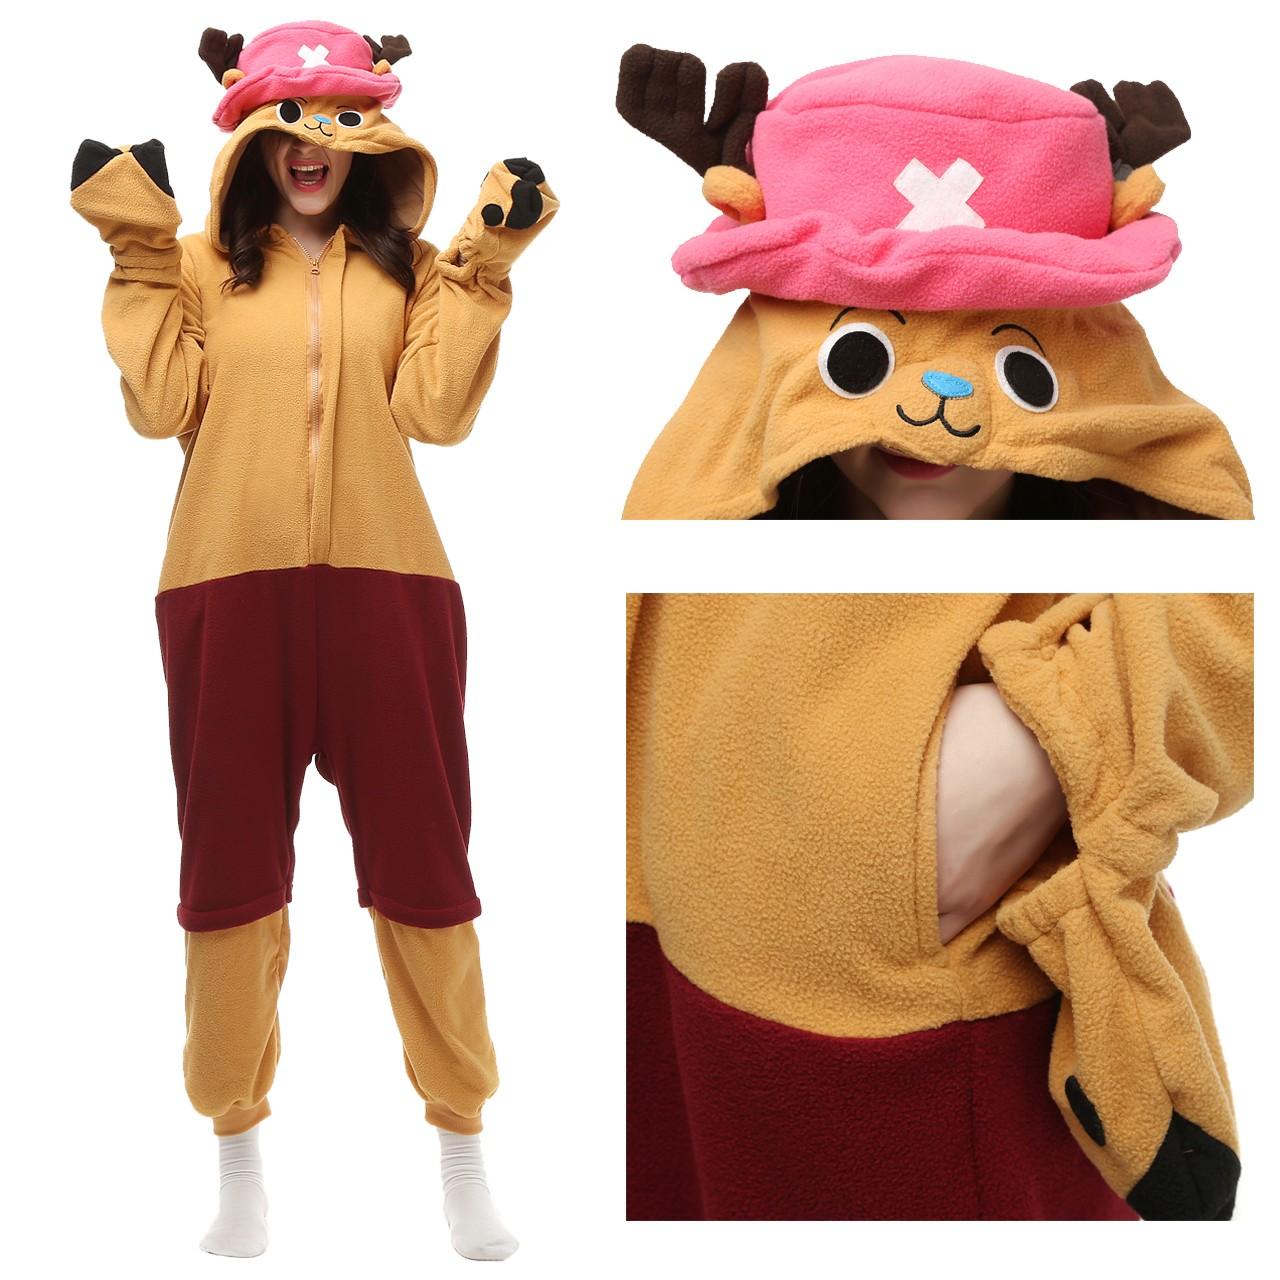 9148c0cc09e1 Tony Tony Chopper Onesie Kigurumi Pajama for Adult One Piece Party Costume